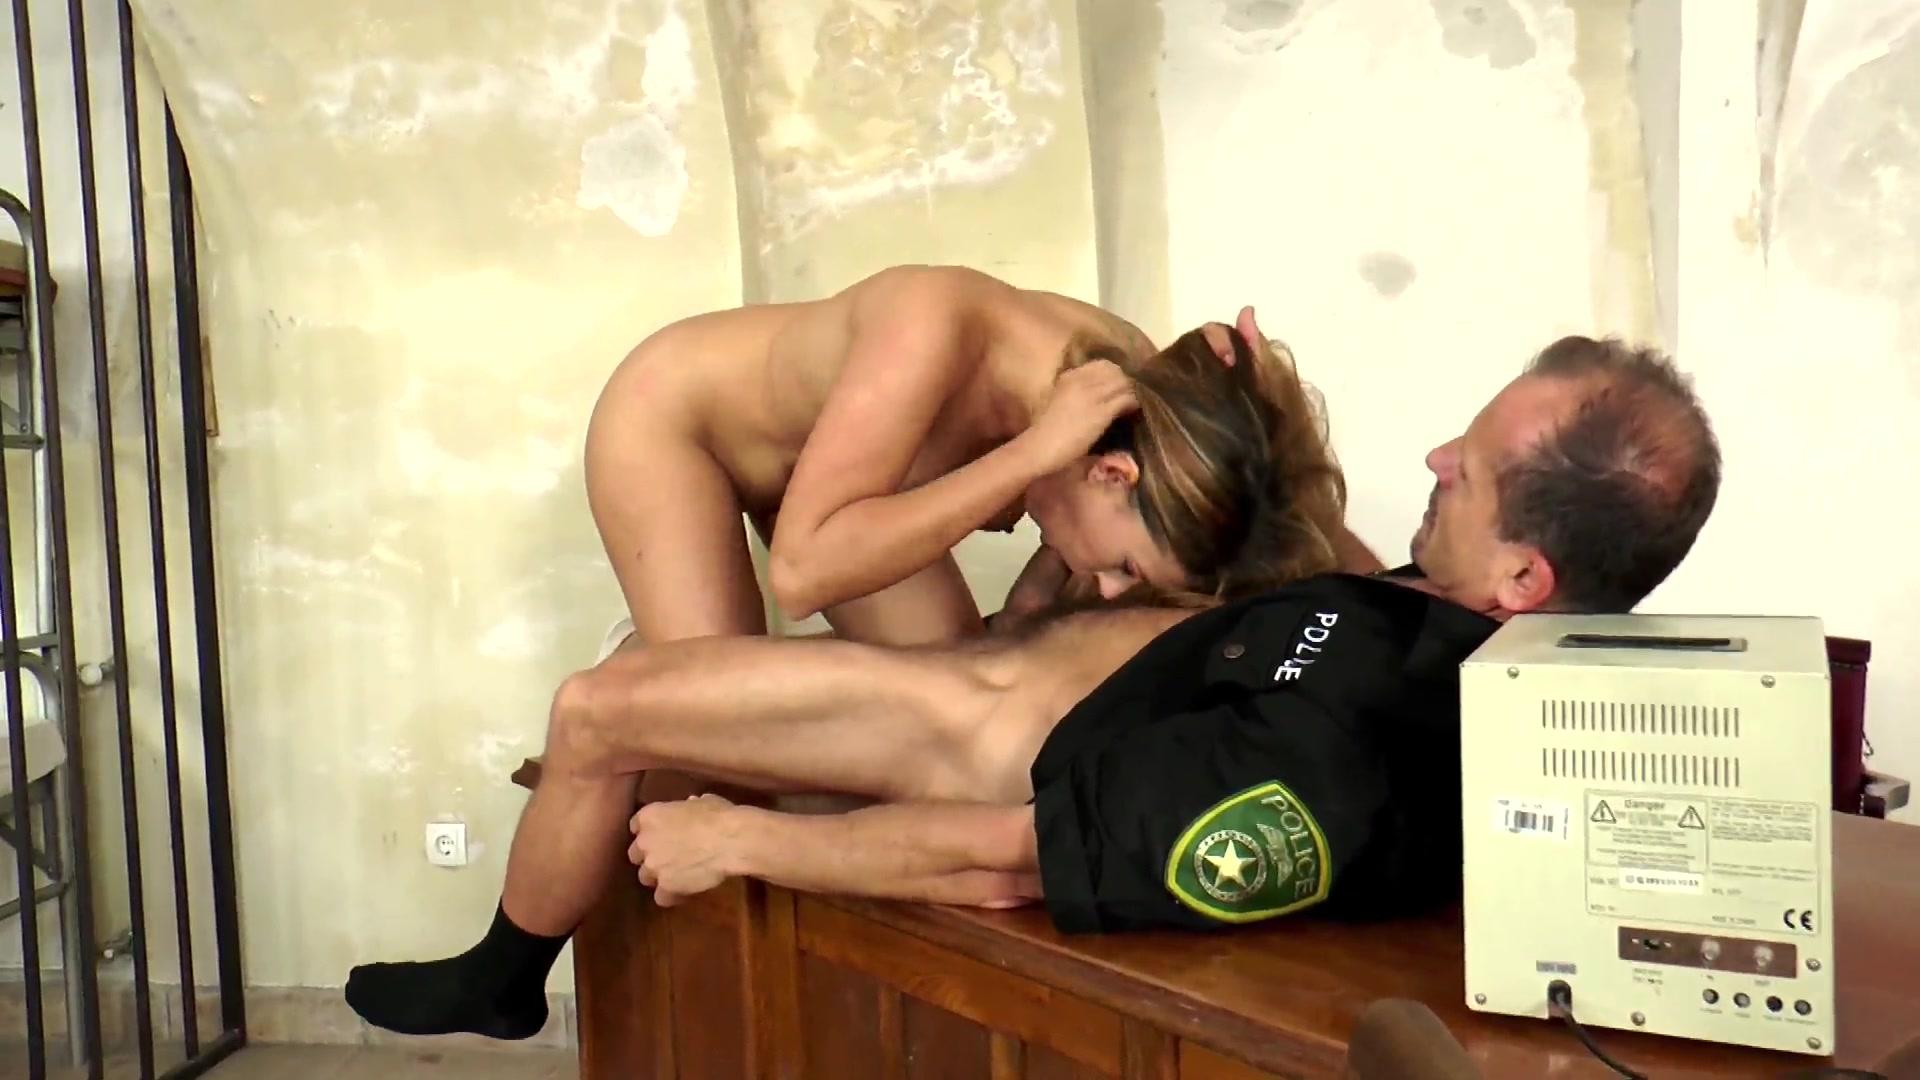 Forced prison rape free porn galery pics, forced prison rape online porn